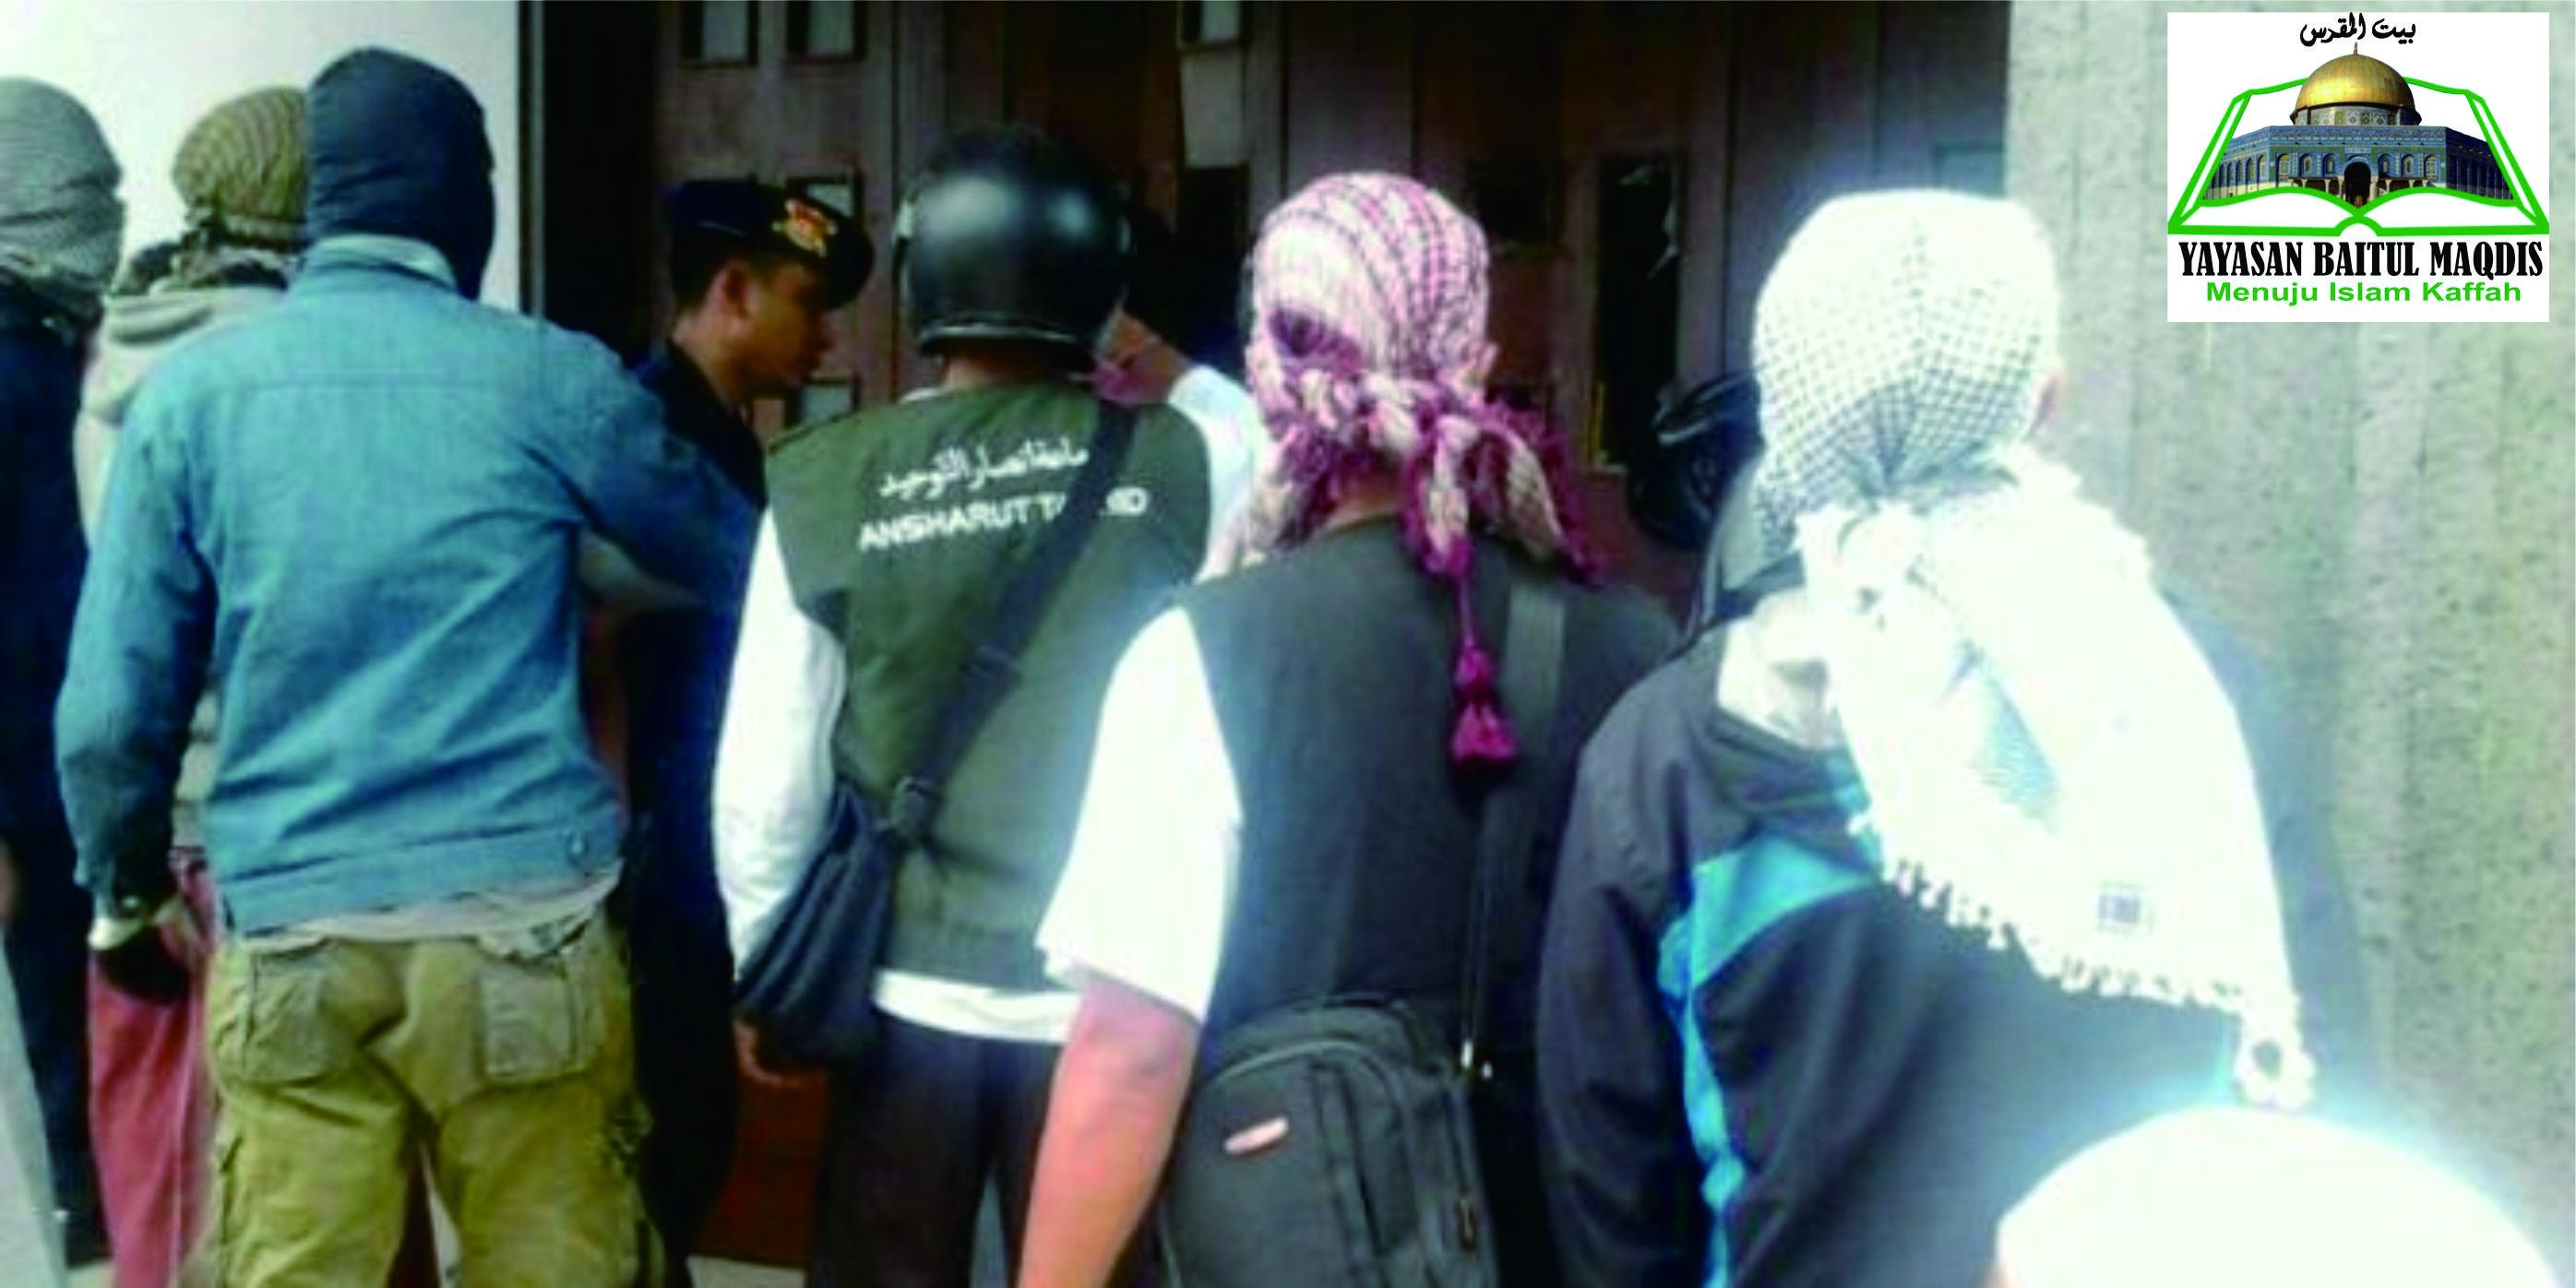 Penuturan Warga Tentang Kronologi Penyegelan Gereja Liar di Yogyakarta (1)